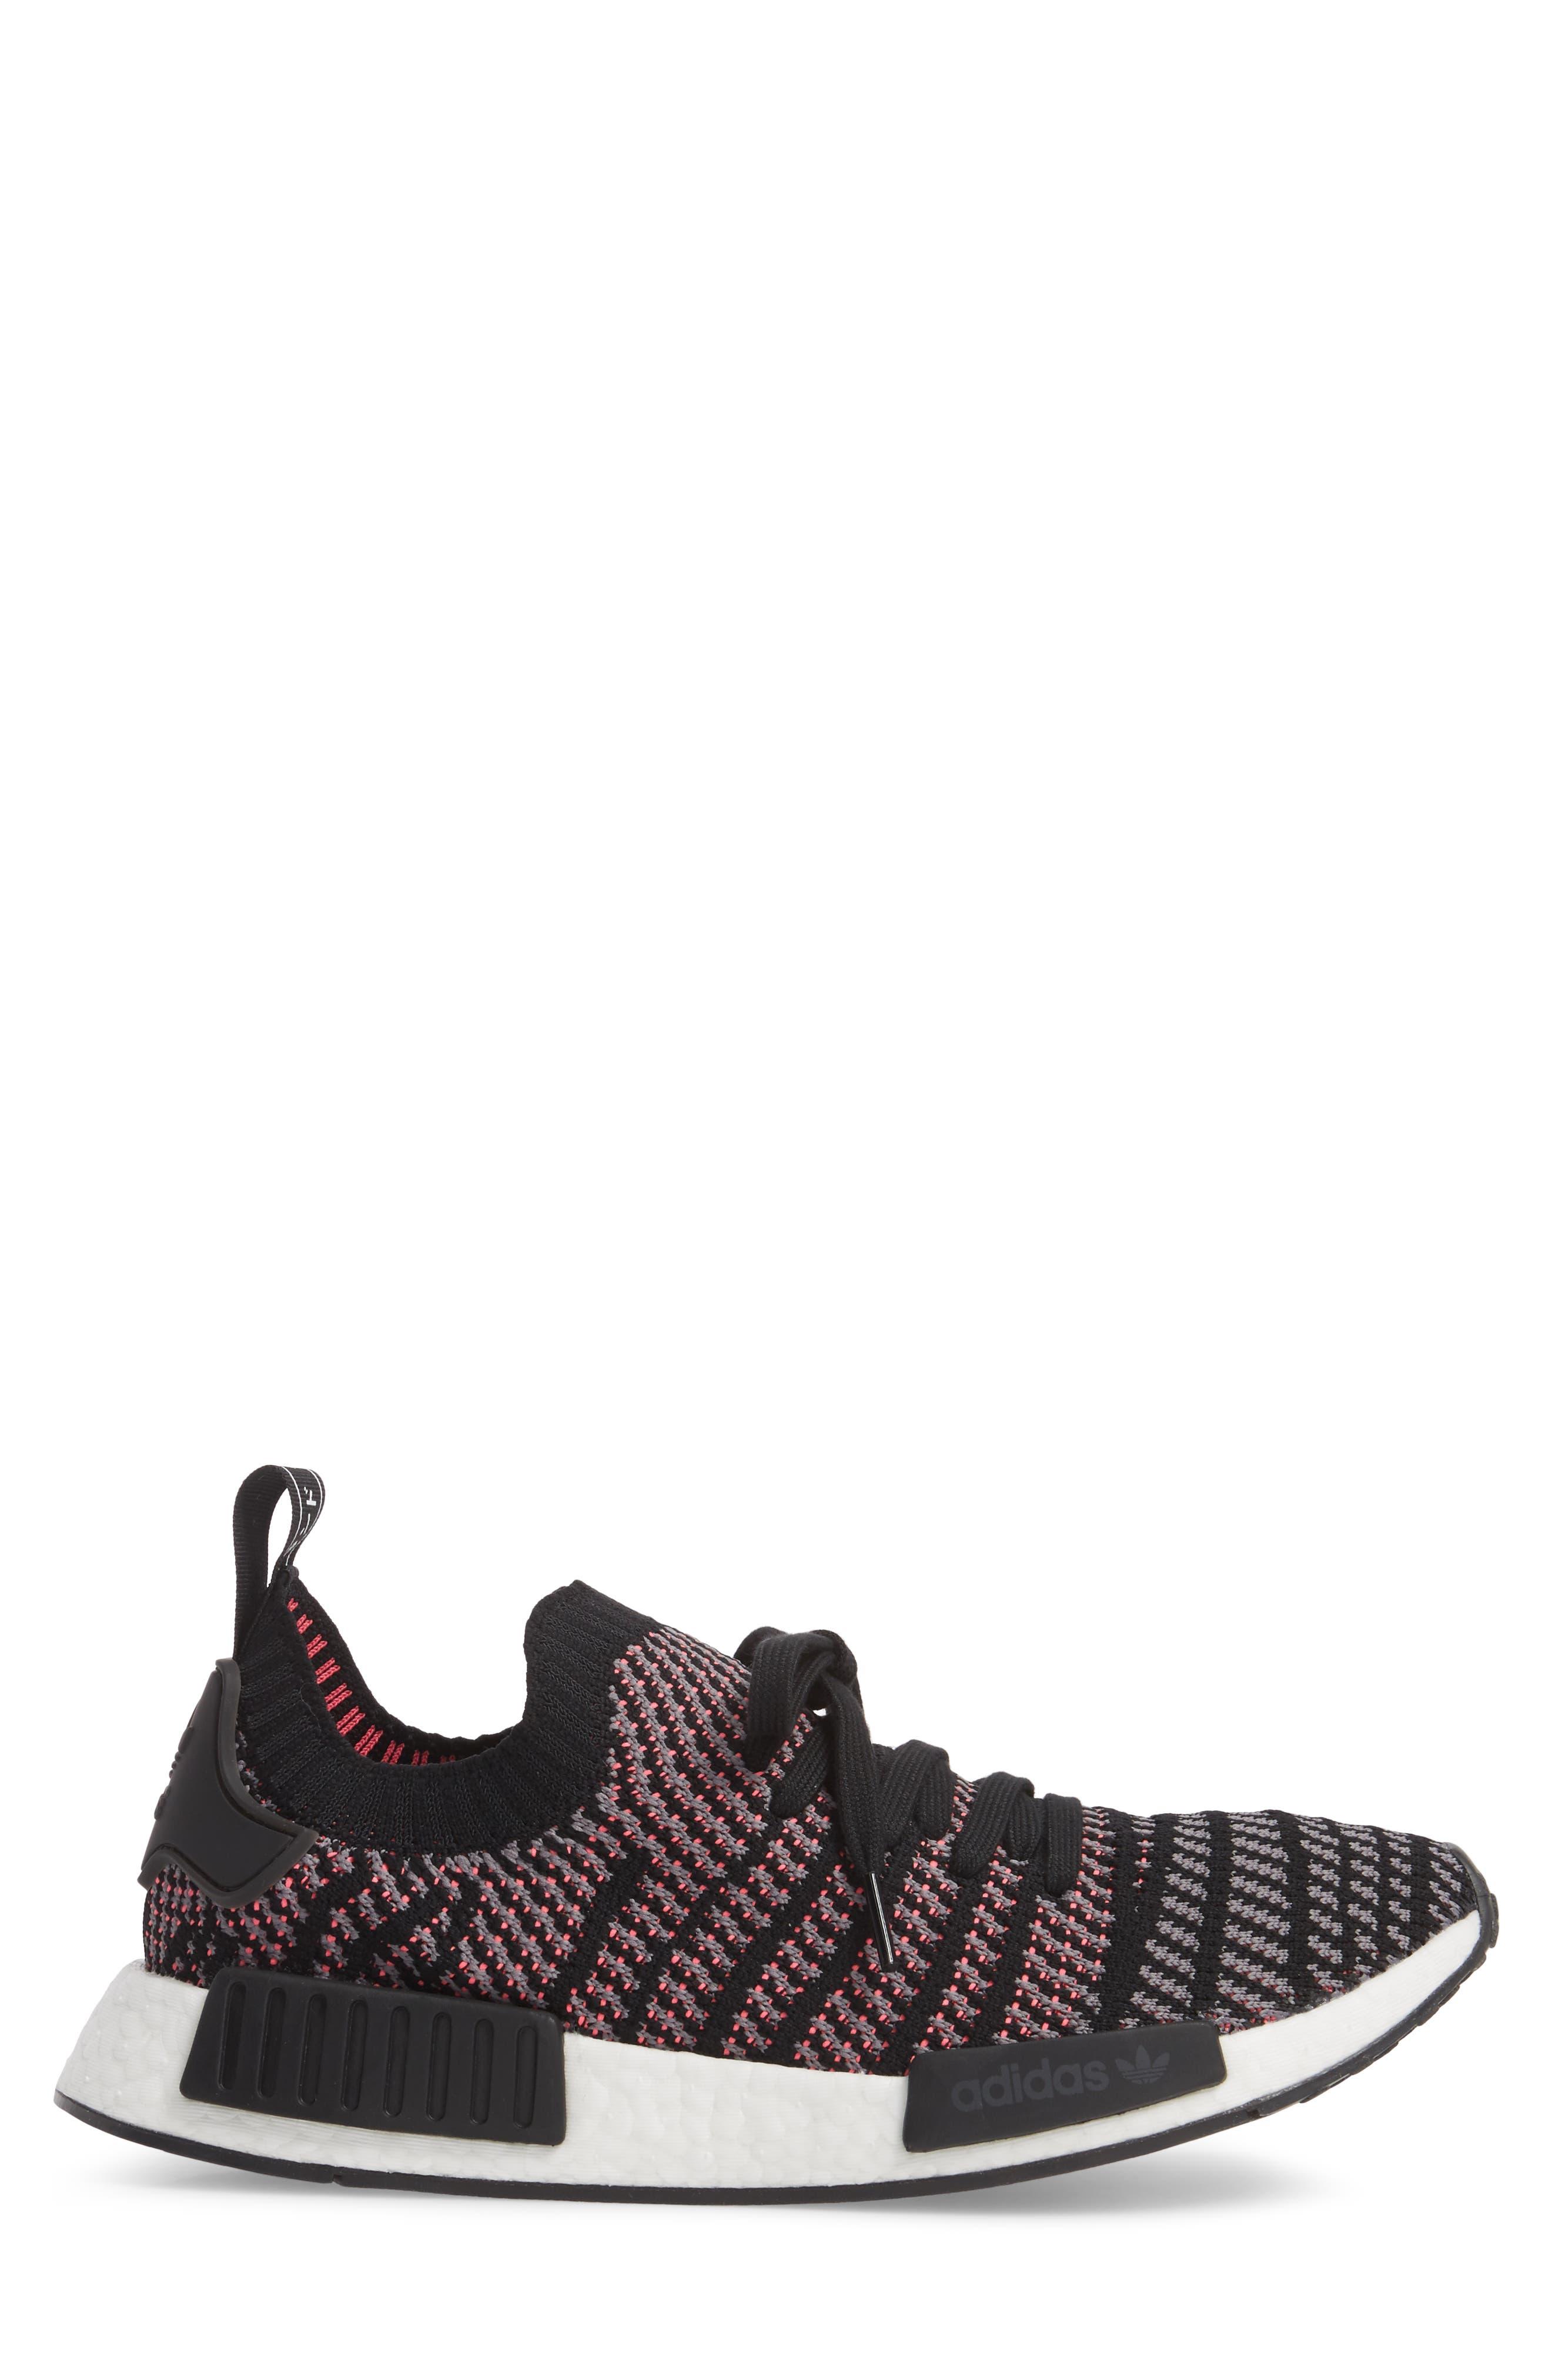 NMD R1 STLT Primeknit Sneaker,                             Alternate thumbnail 6, color,